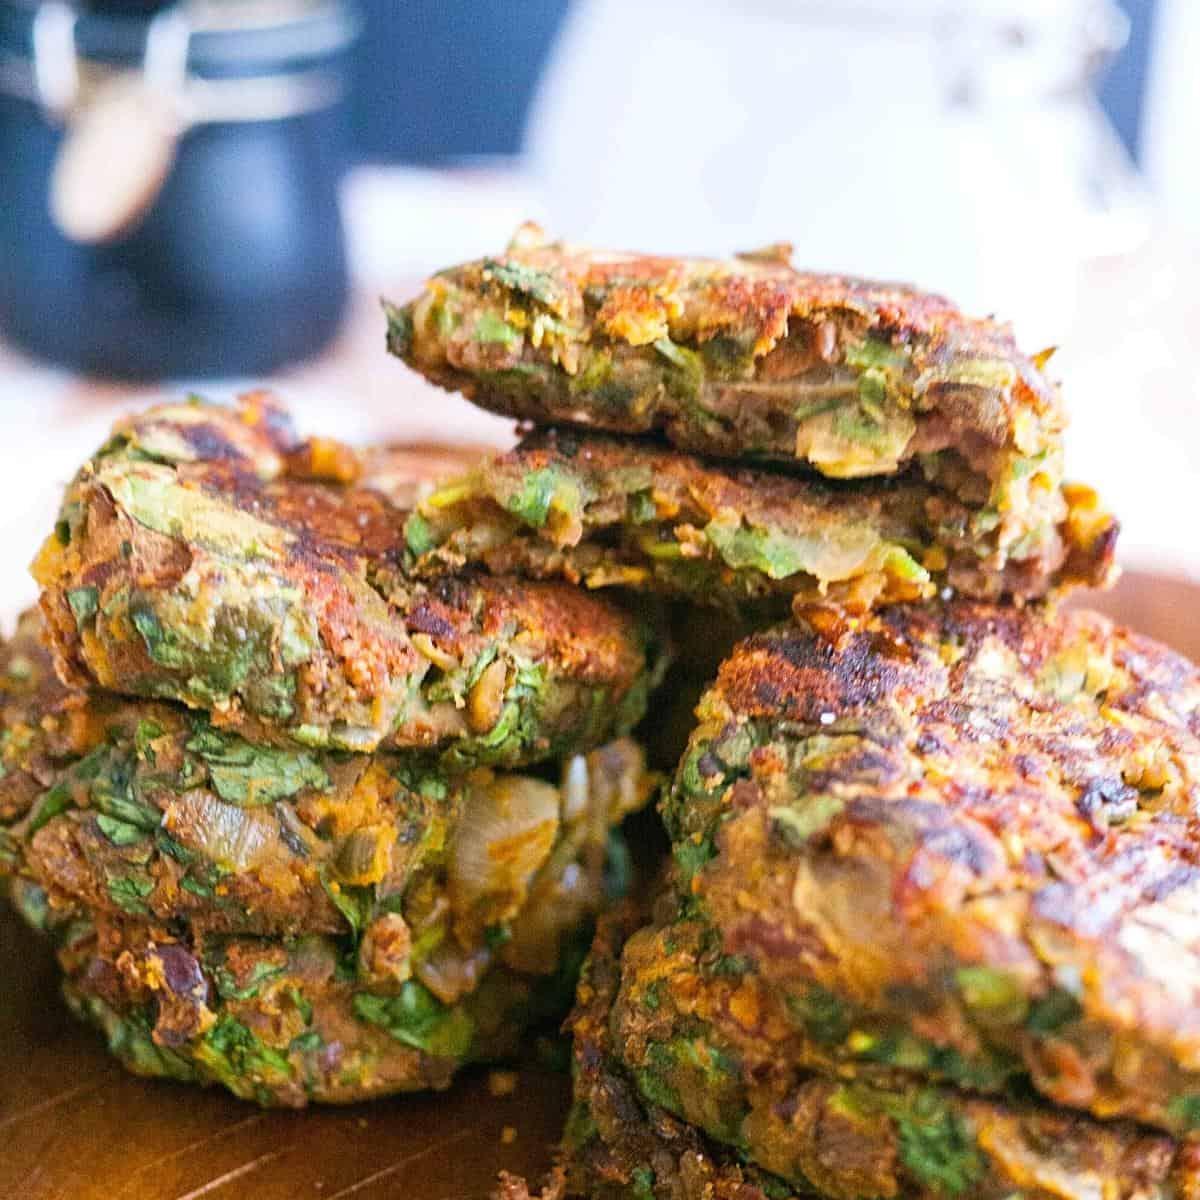 A stack of vegan kidney bean patties.